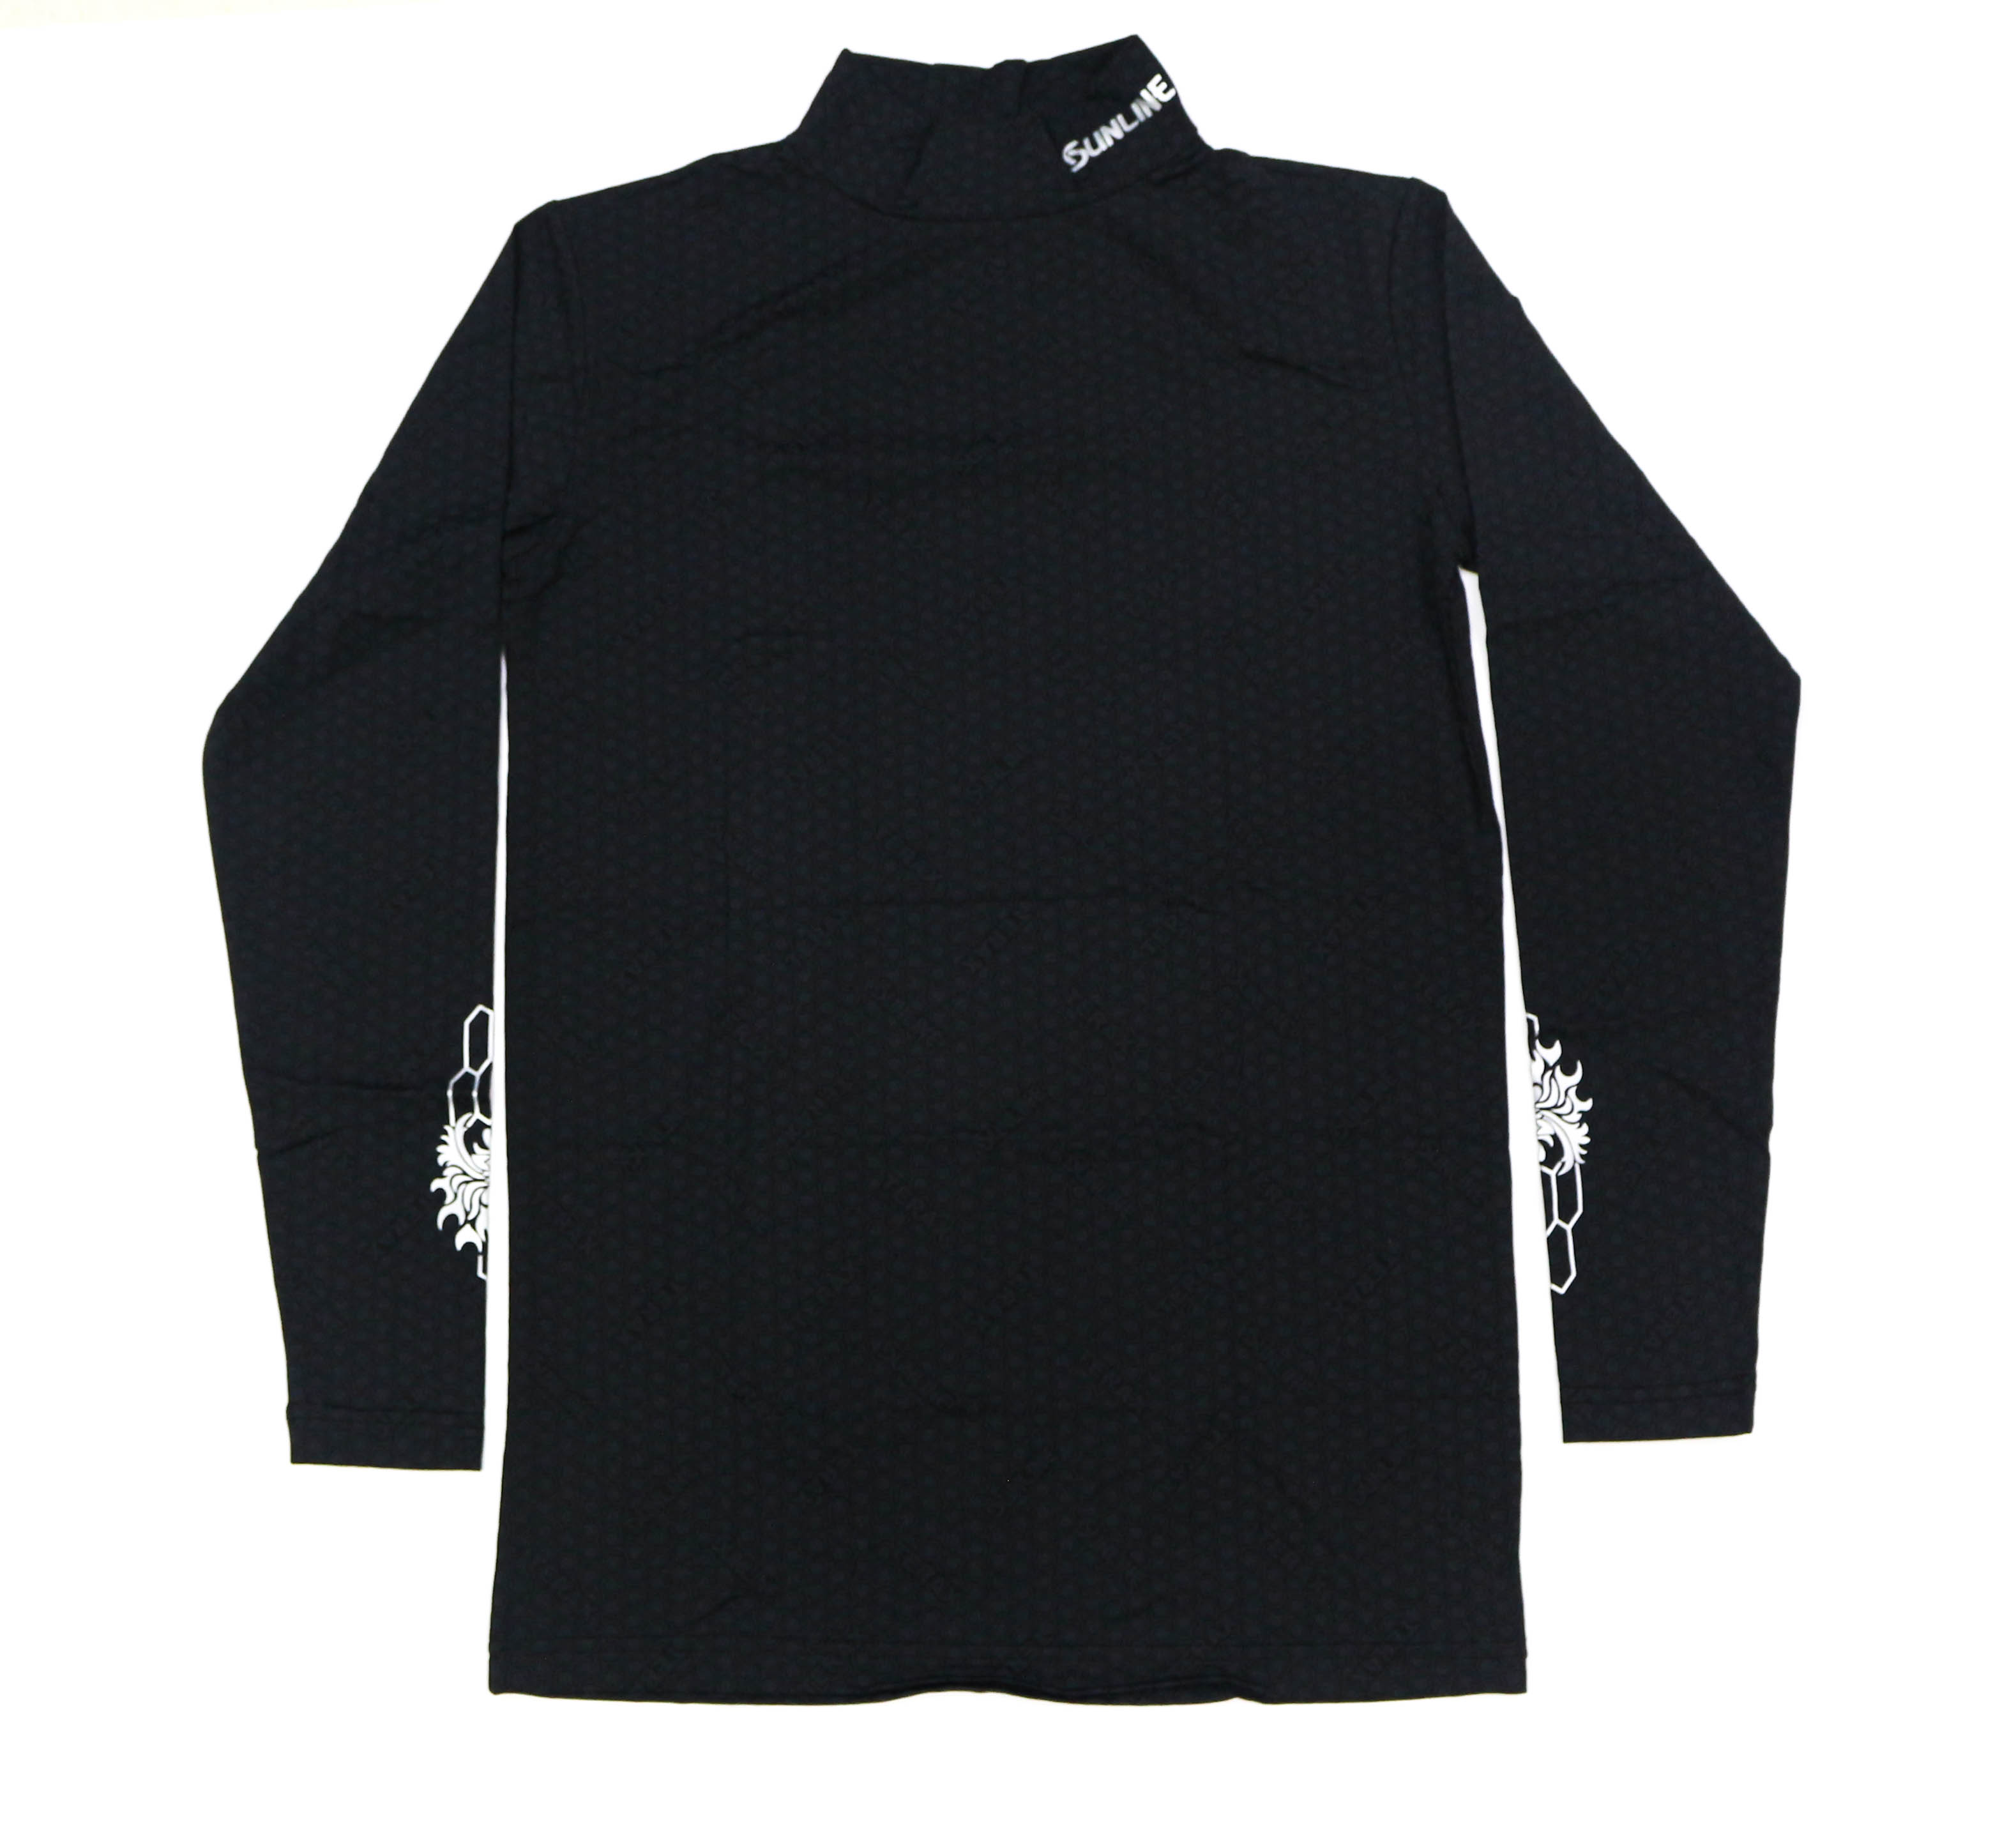 Sunline SUW-5535CW Undershirt Terax Cool Black Size LL (2433)